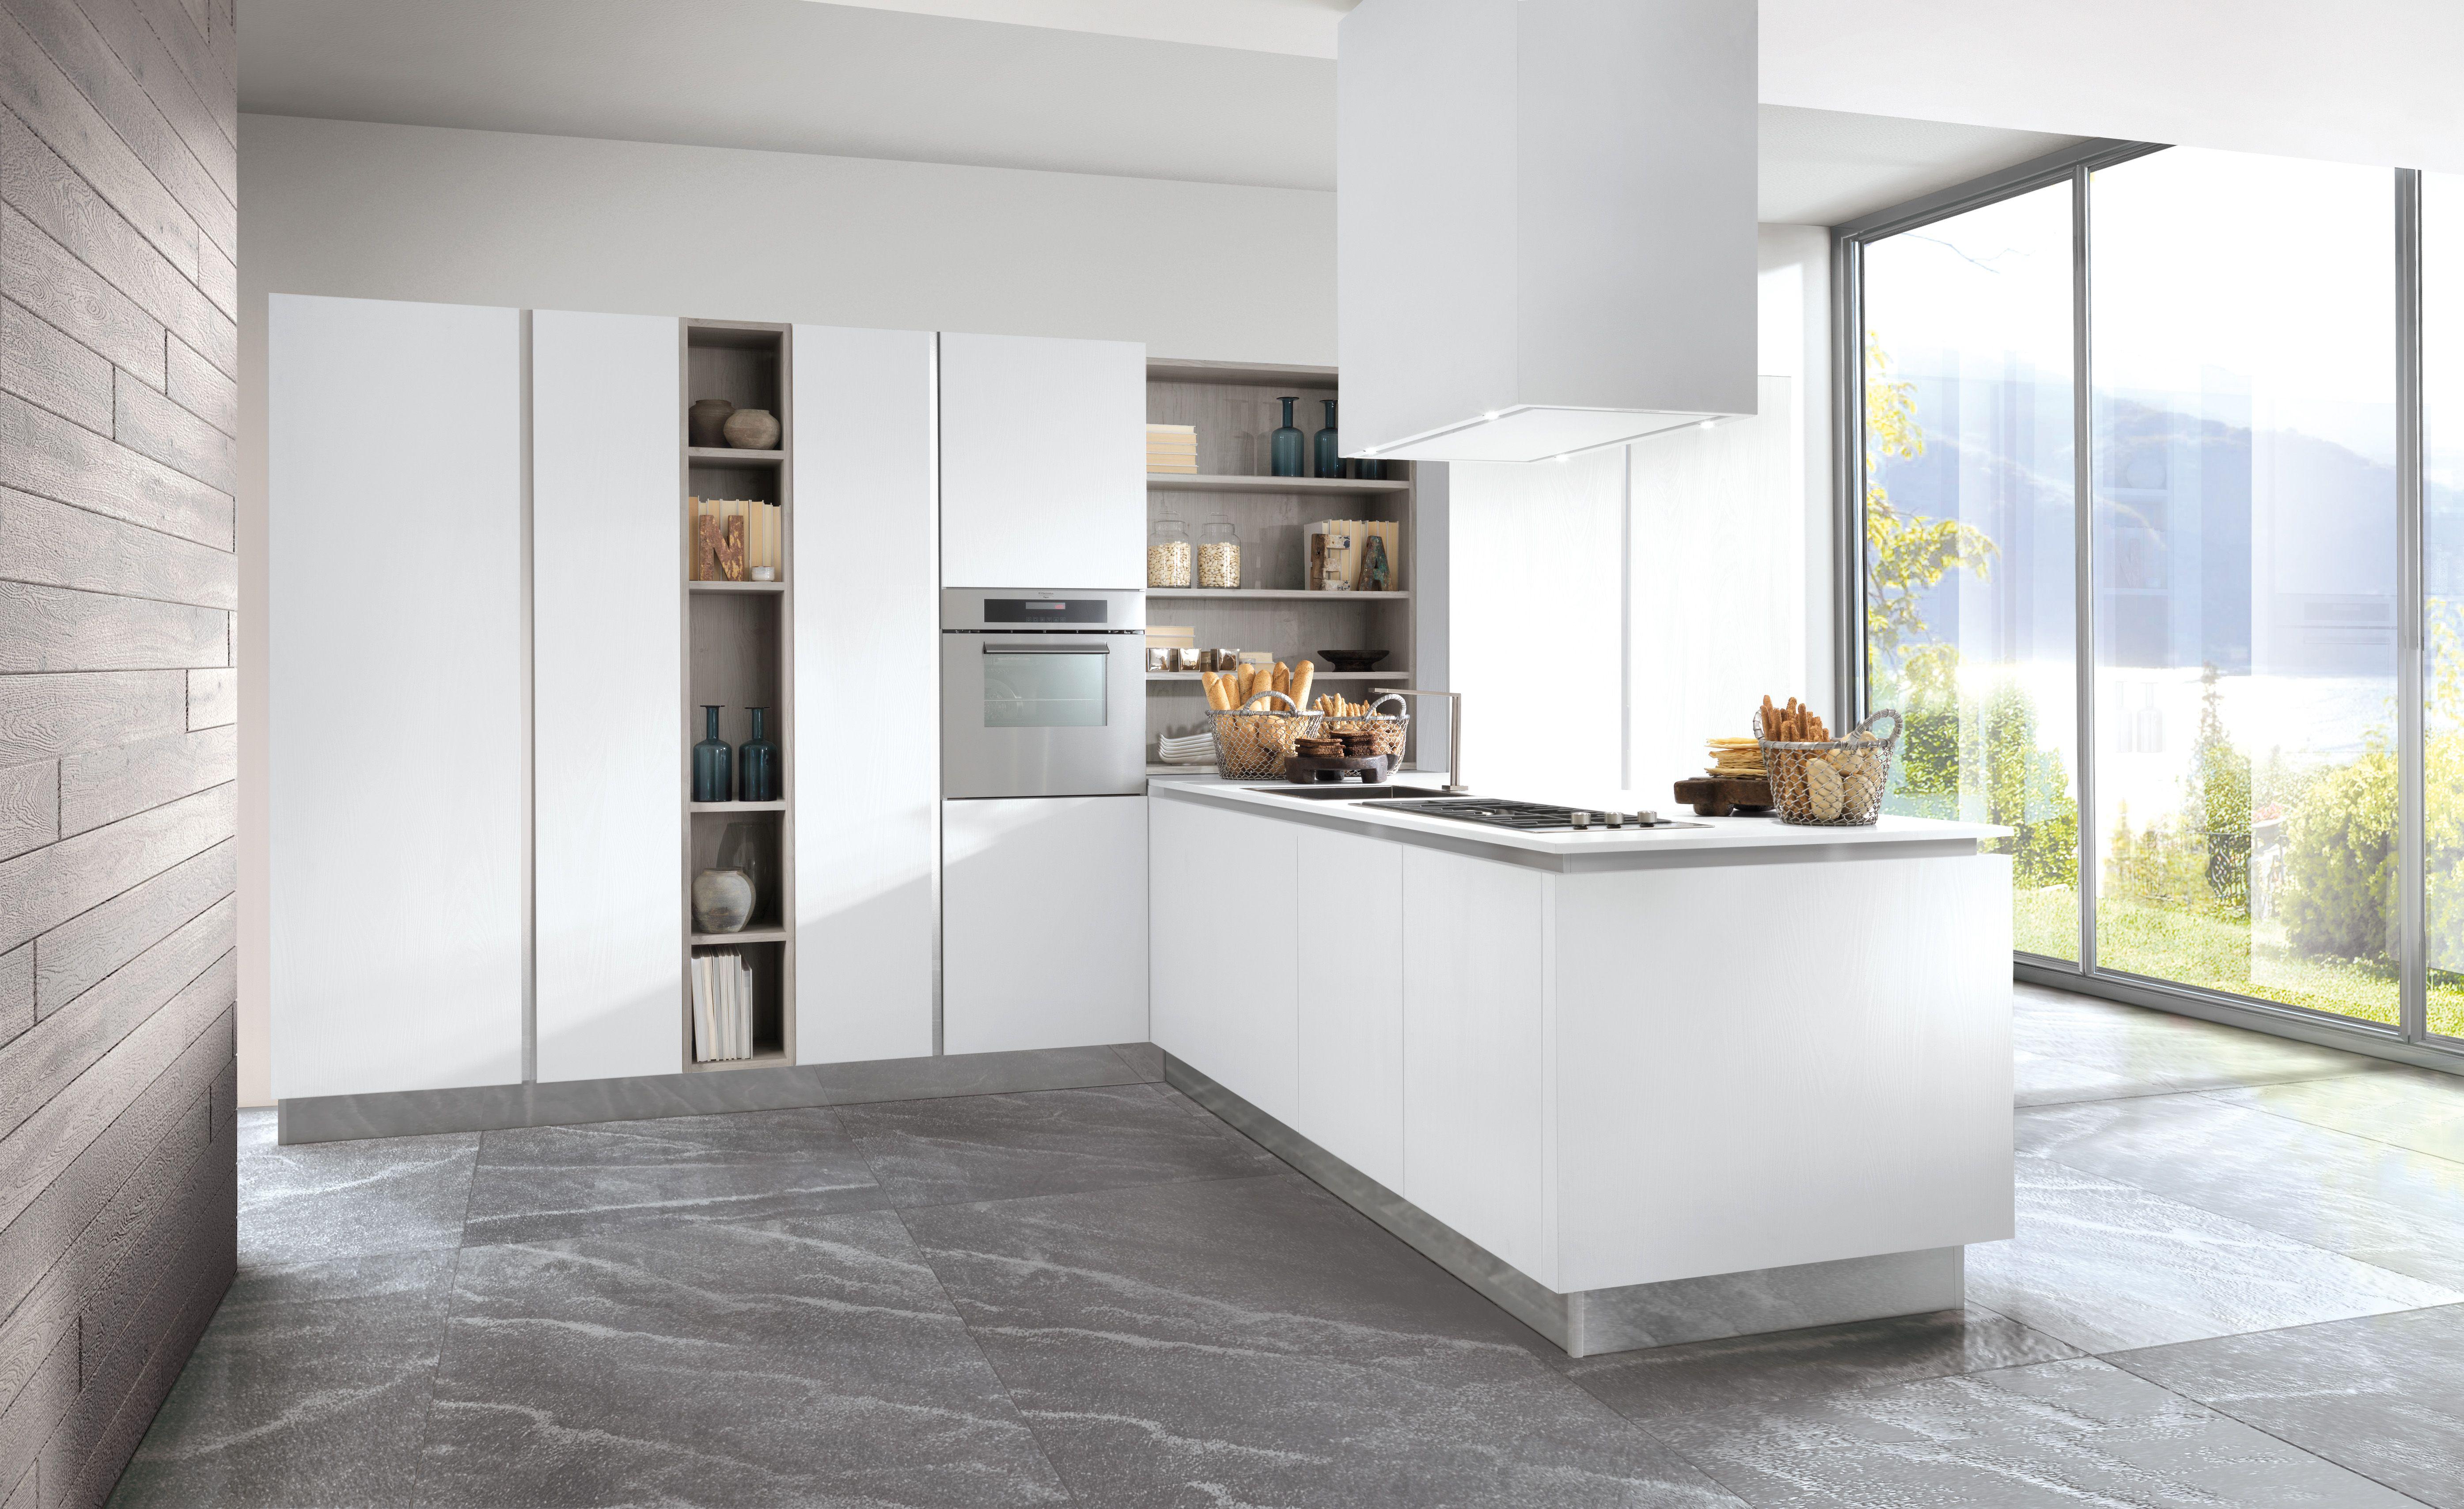 Stunning Cucina Berloni B50 Pictures - Ideas & Design 2017 ...